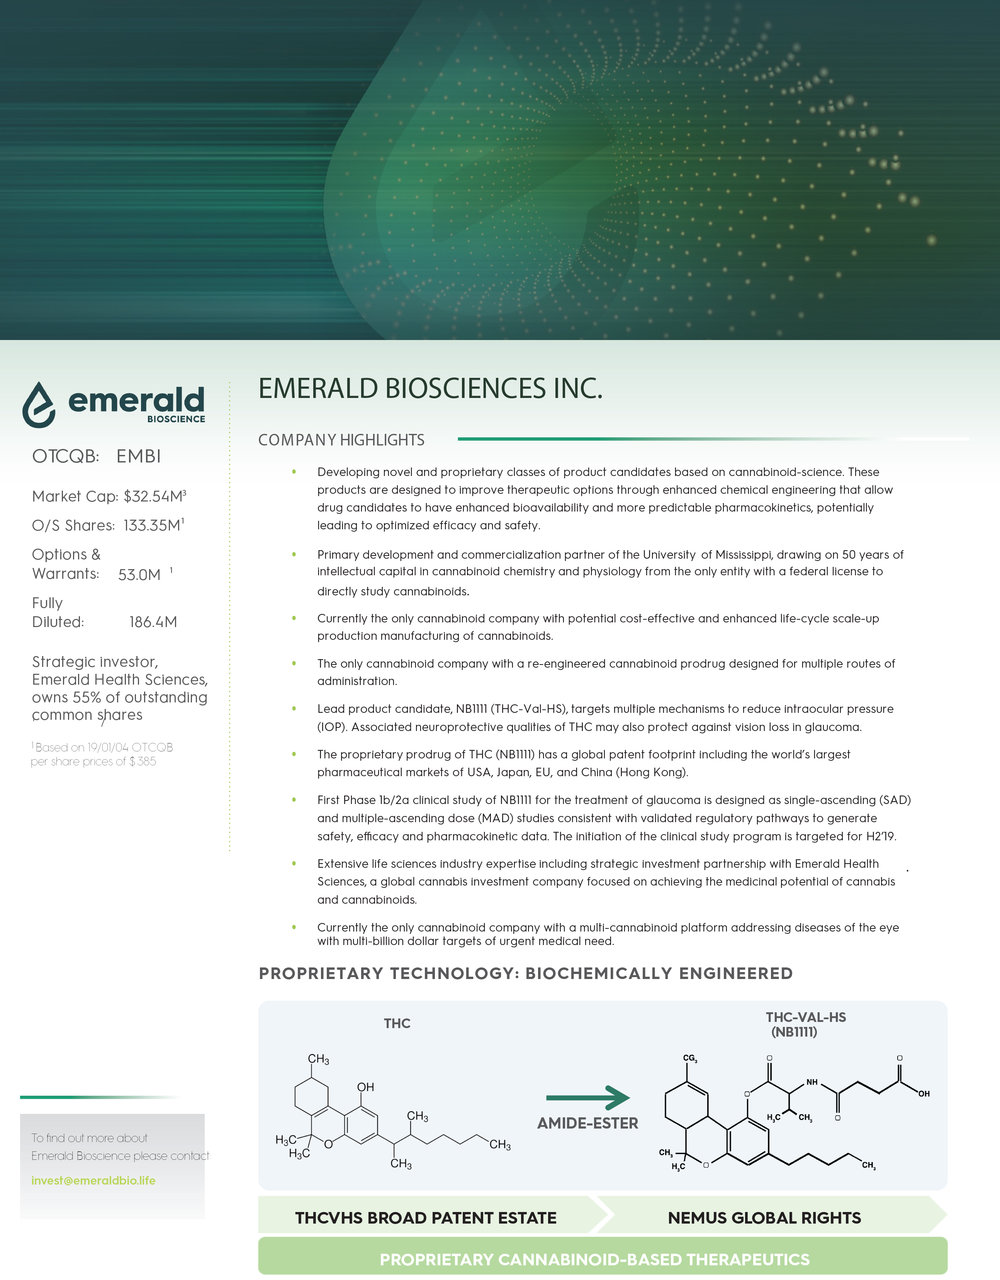 EMBI Fact Sheet_03.25.19.jpg